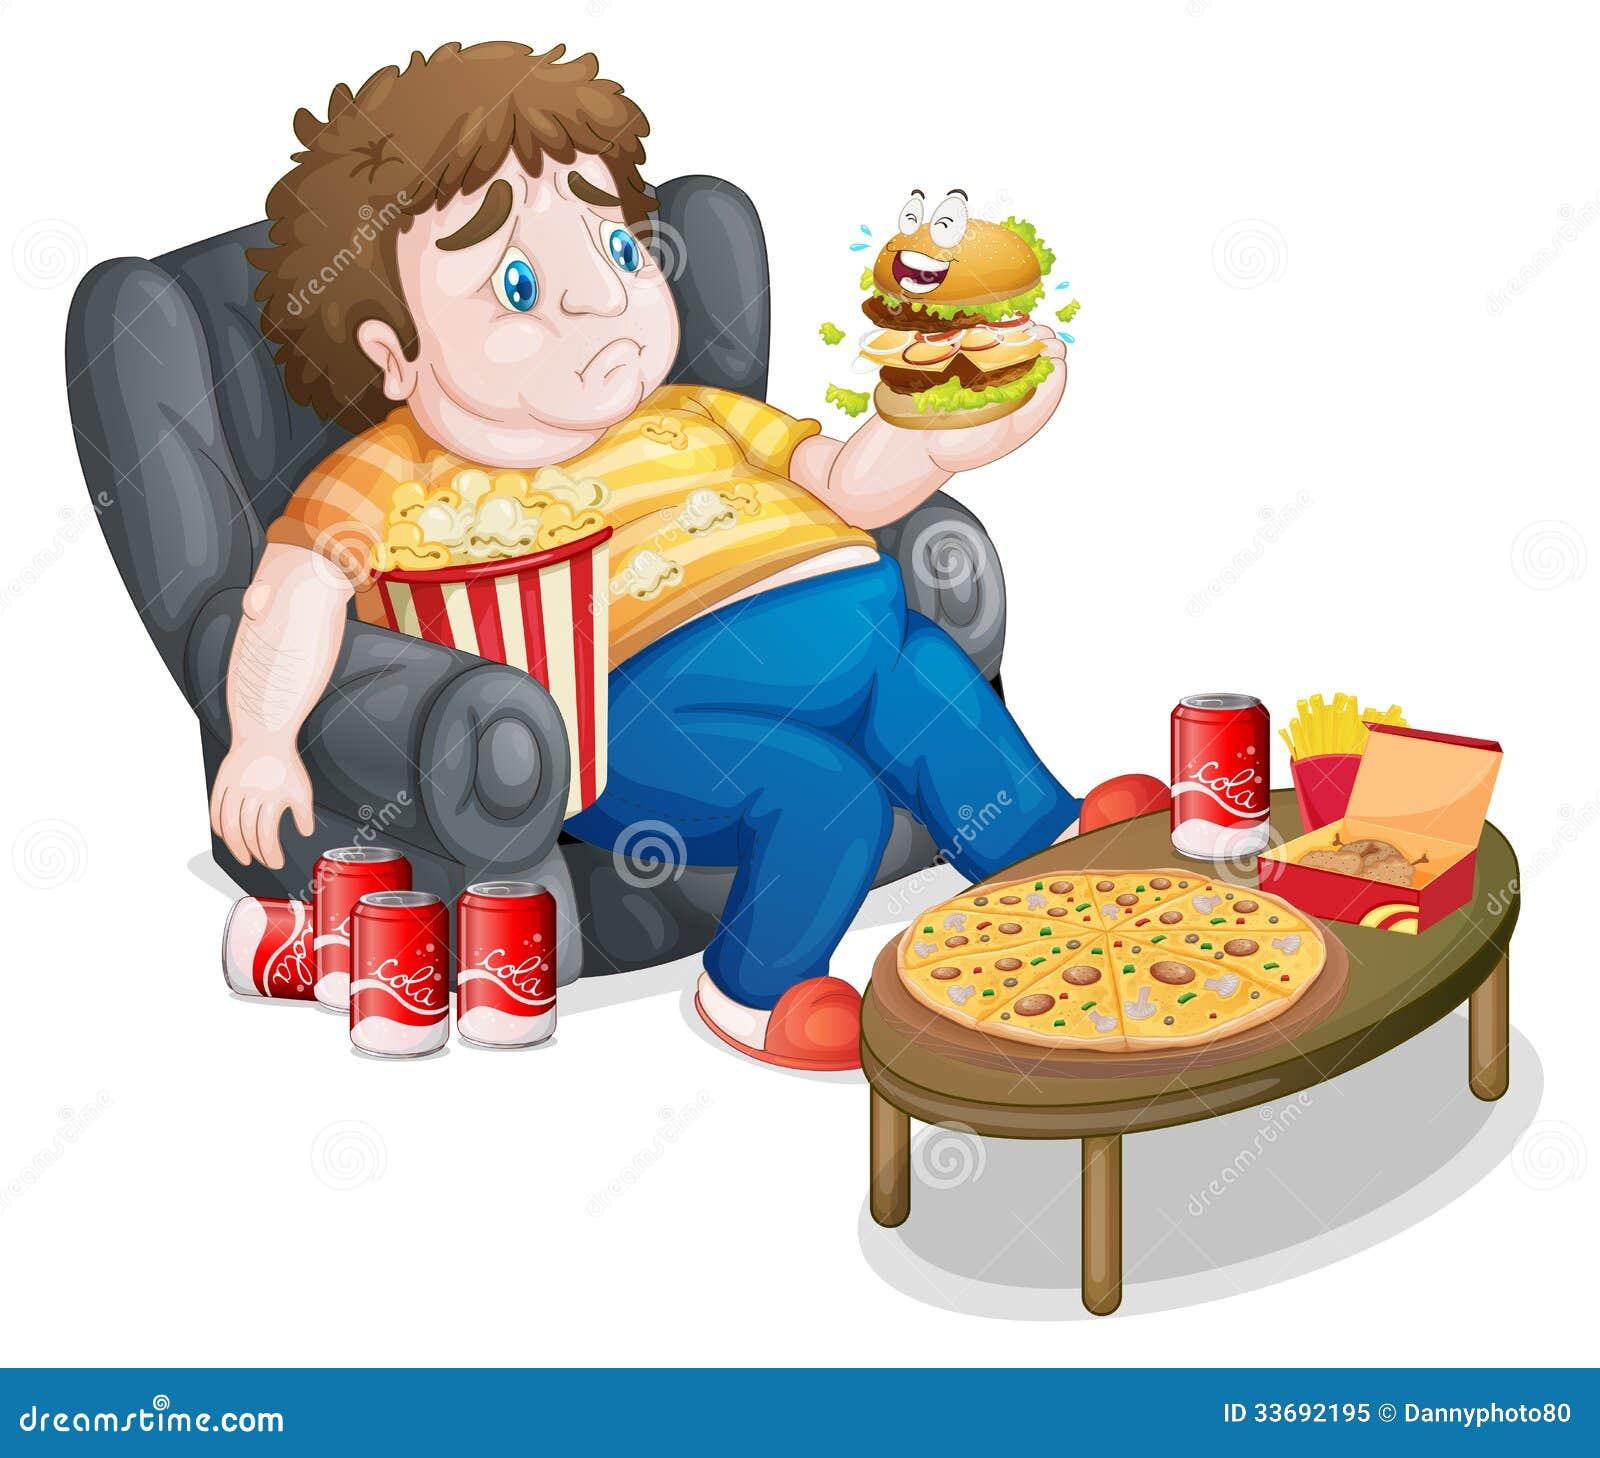 Guy Eating Food Stock Photo